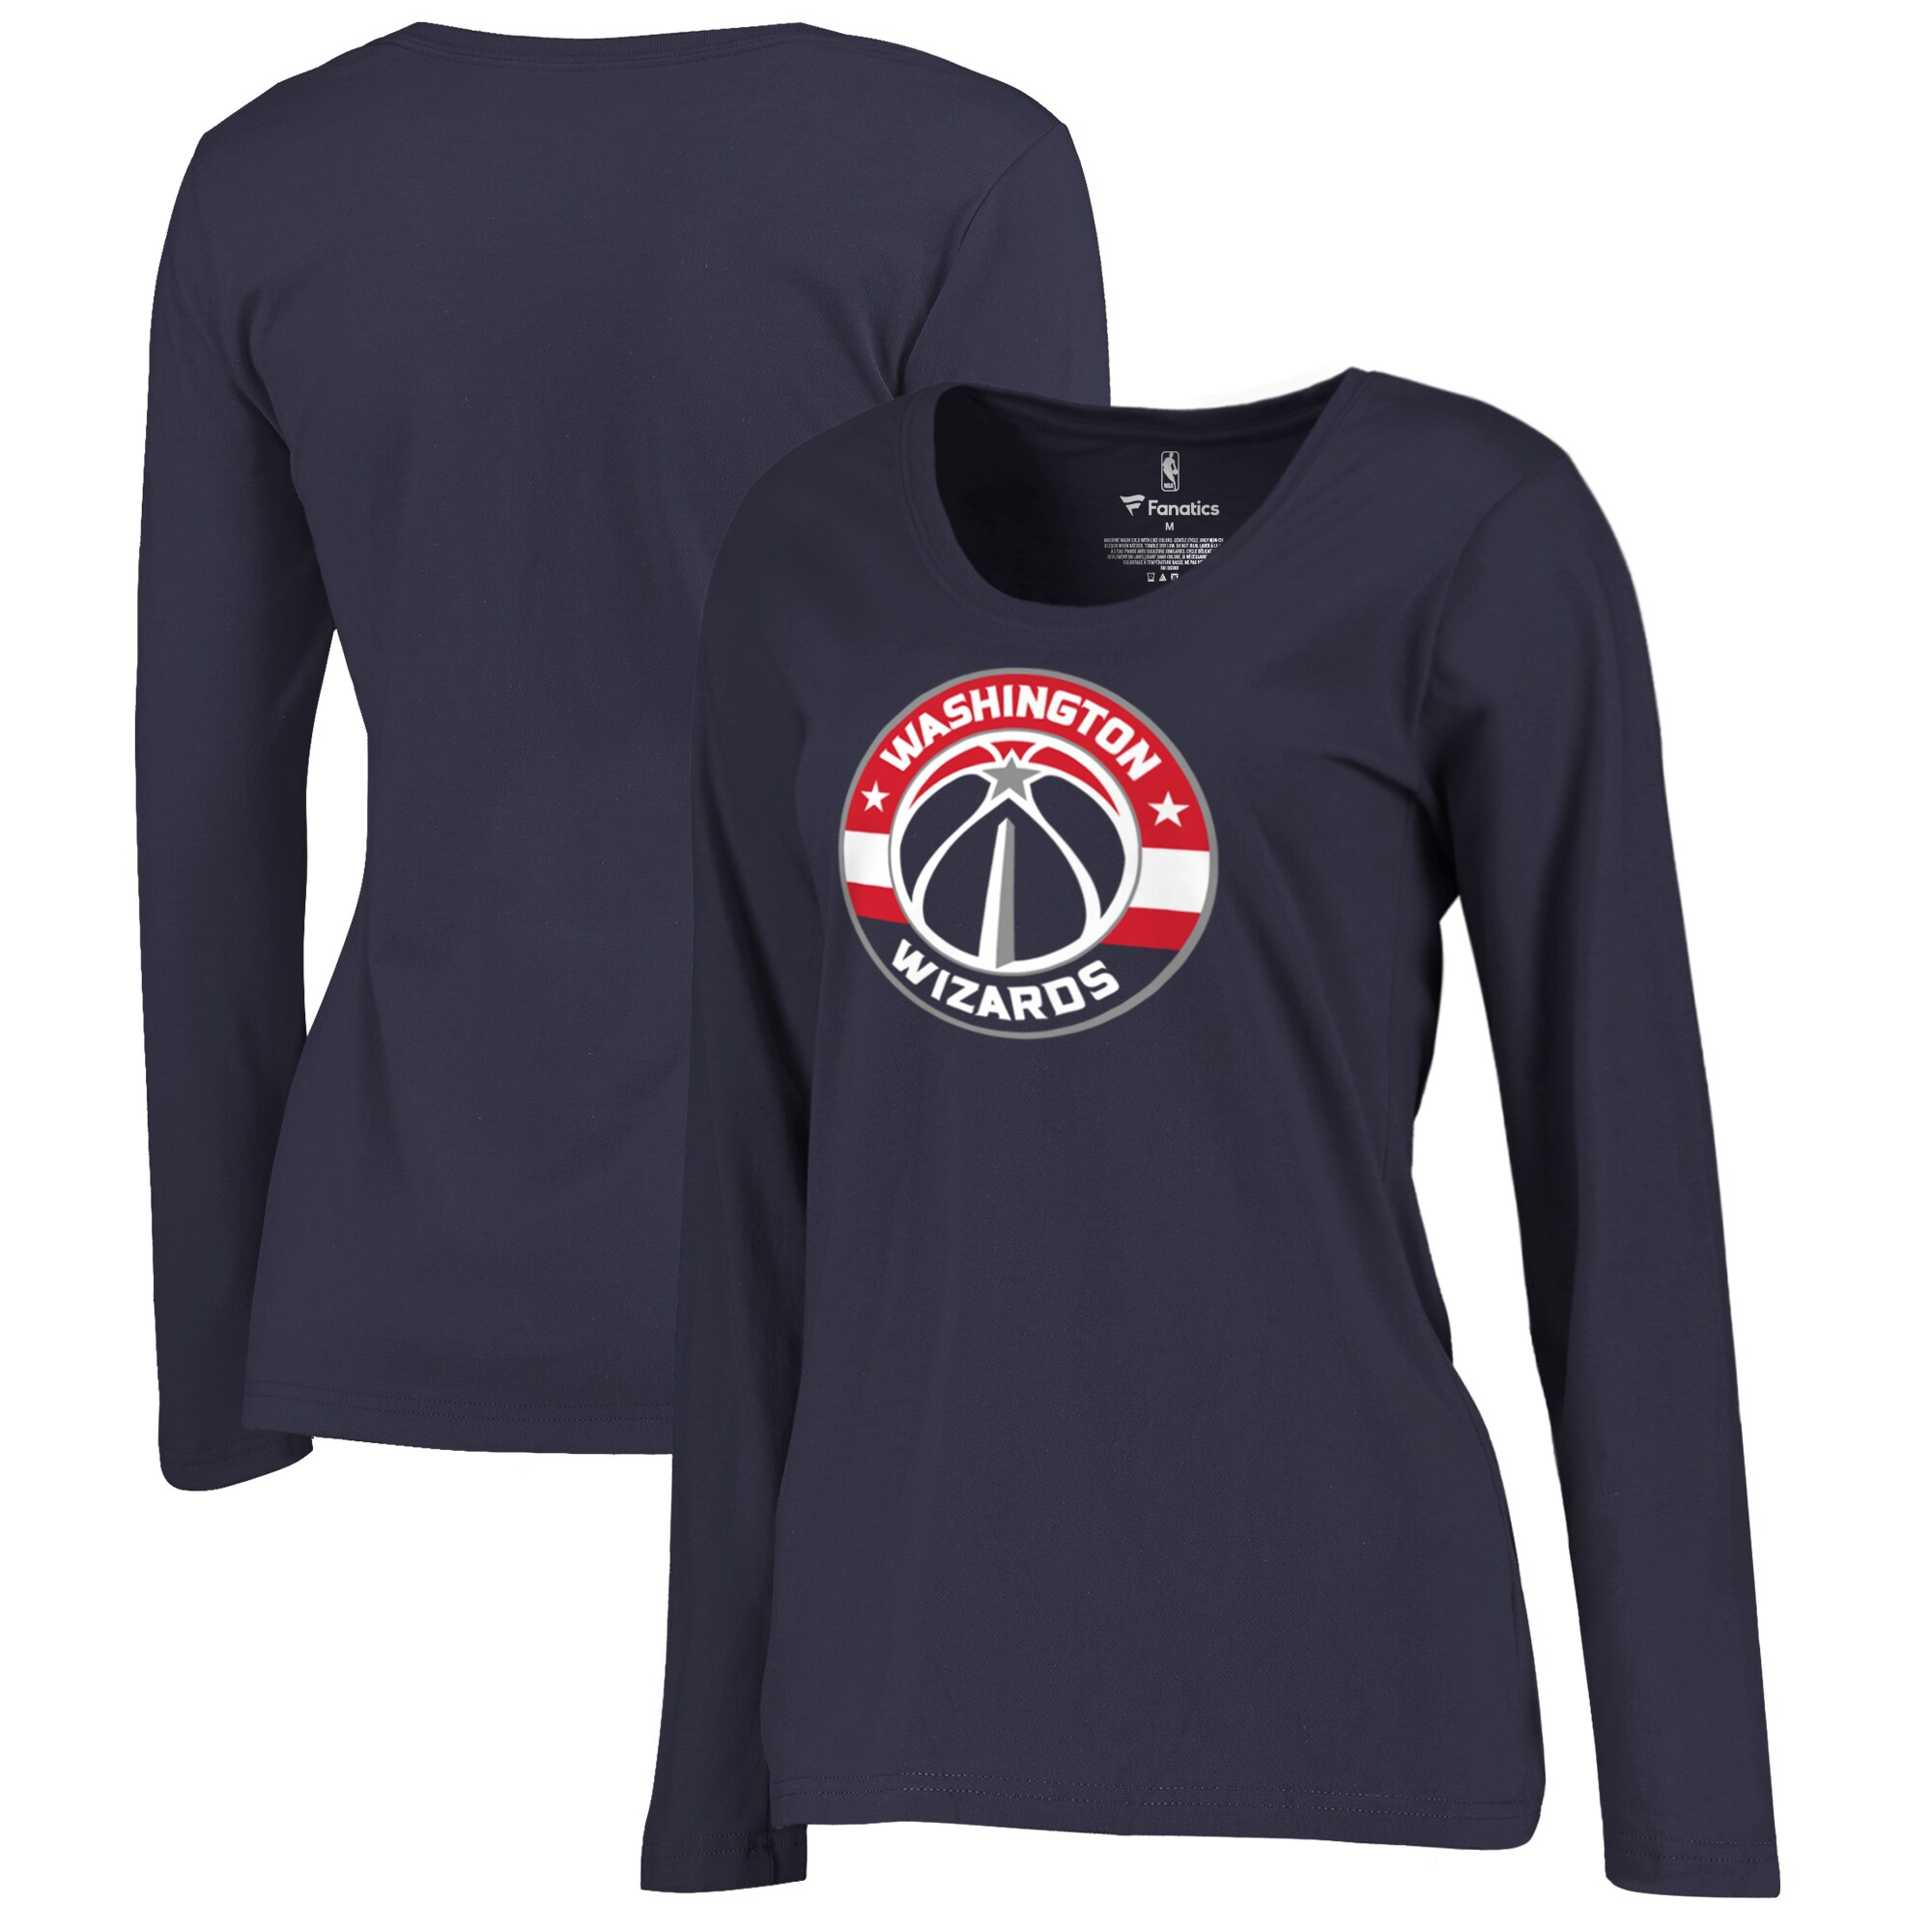 Washington Wizards Fanatics Branded Women's Plus Size Primary Logo Long Sleeve T-Shirt - Navy